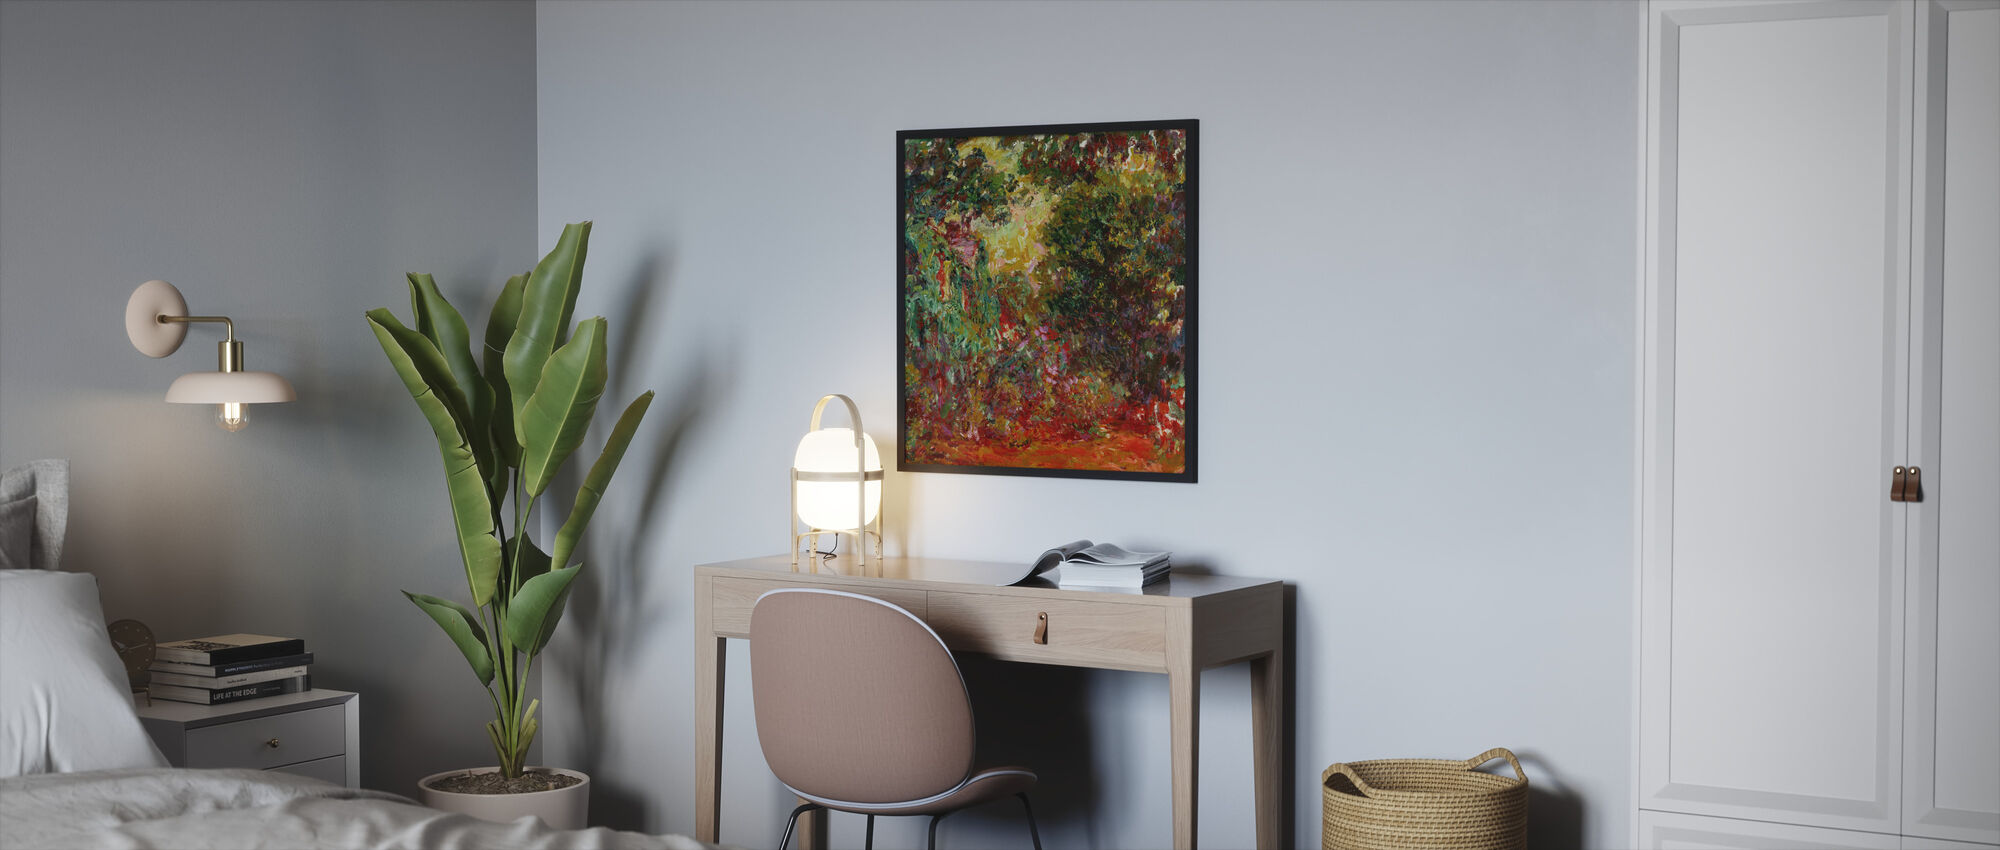 Rose hage - Claude Monet - Innrammet bilde - Soverom